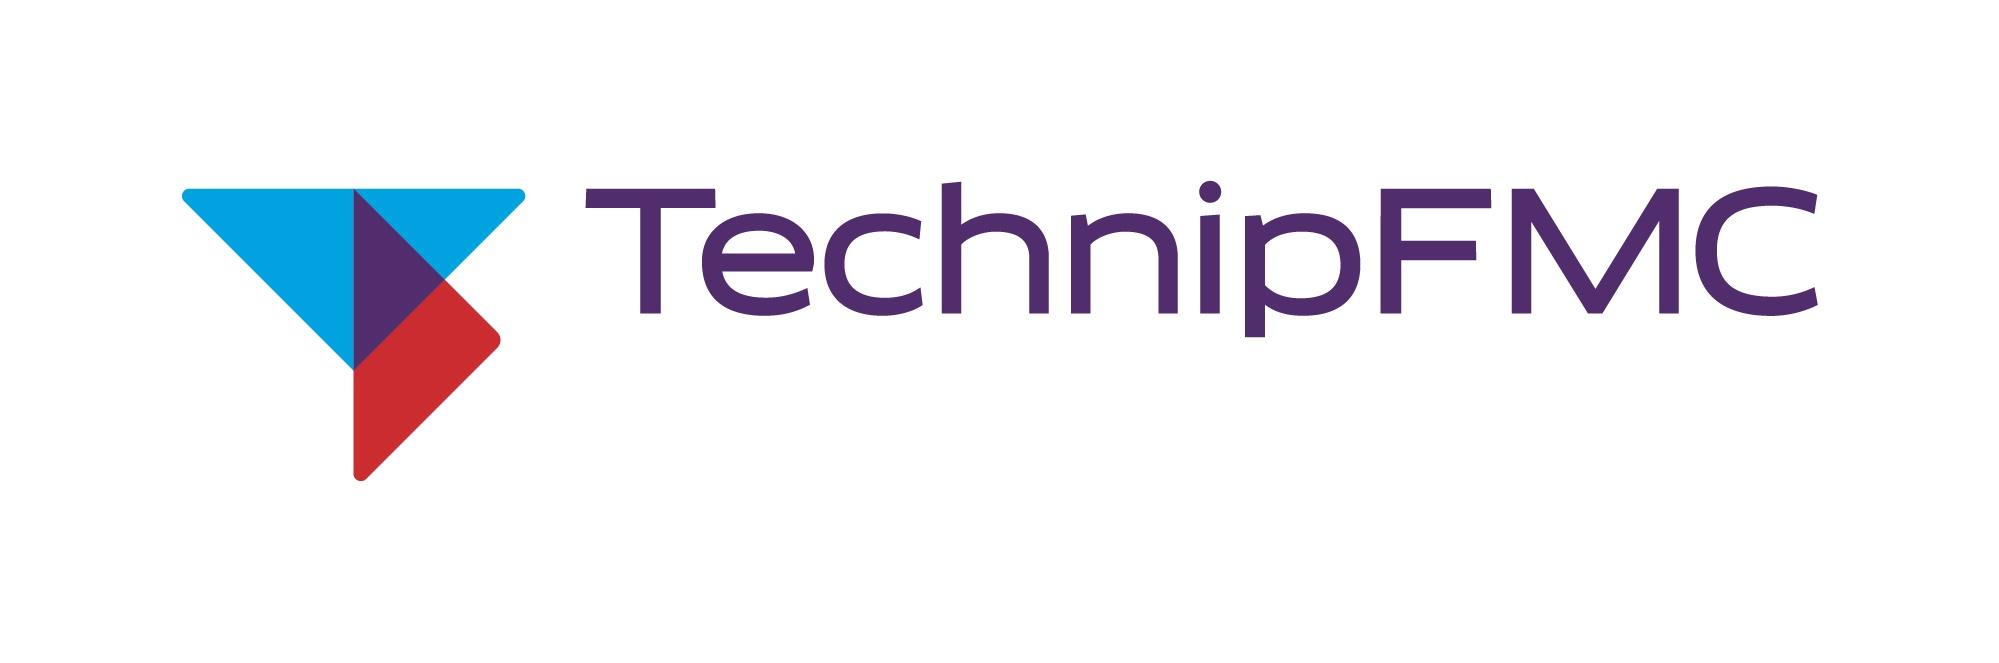 logo_TECHNIPFMC_2021